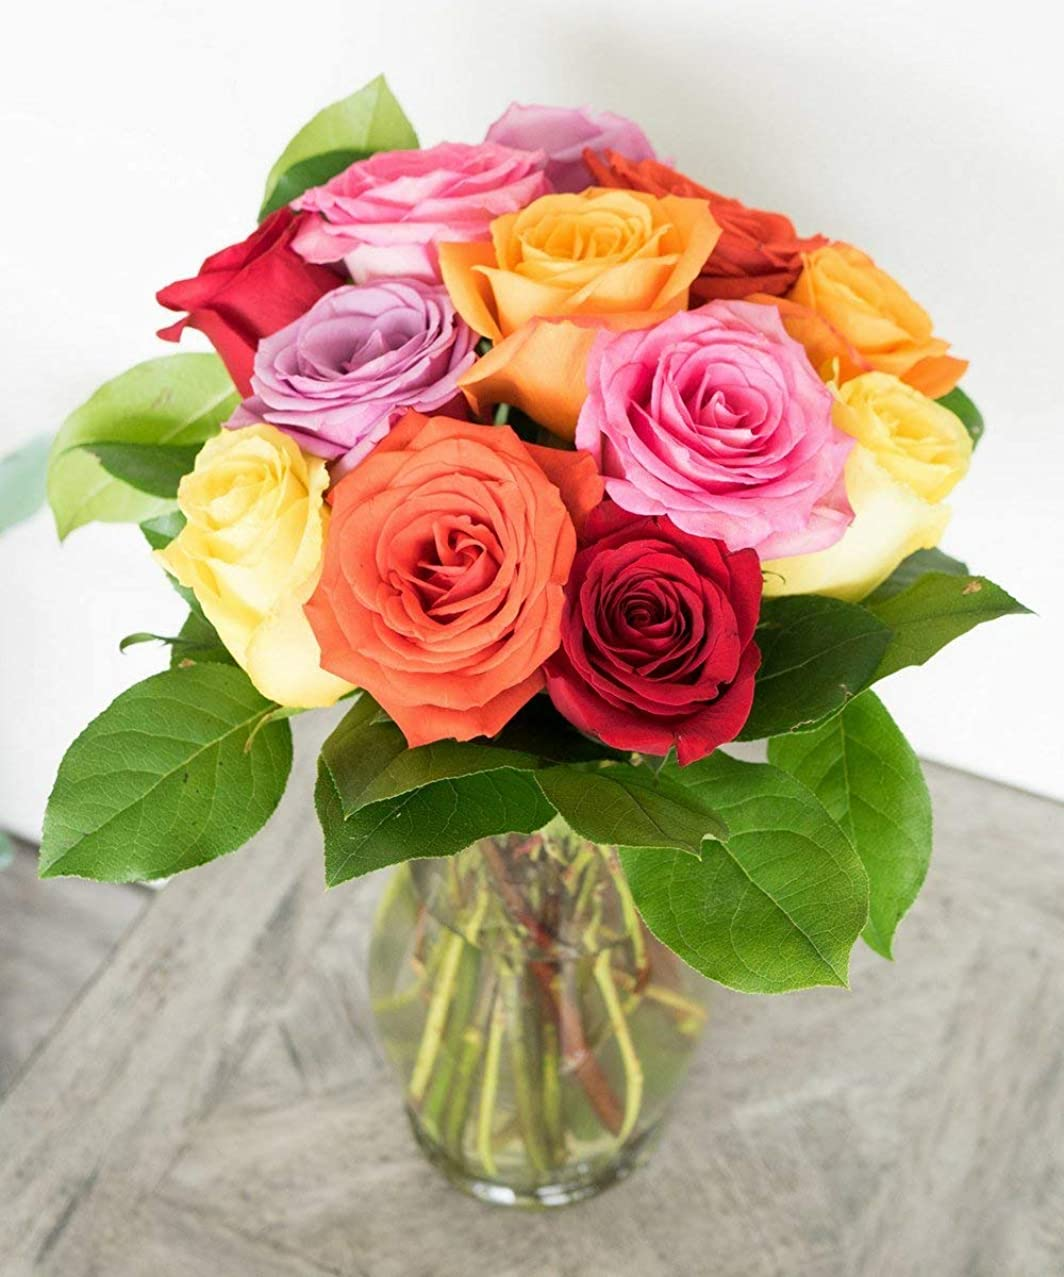 One Dozen Mixed Color Roses